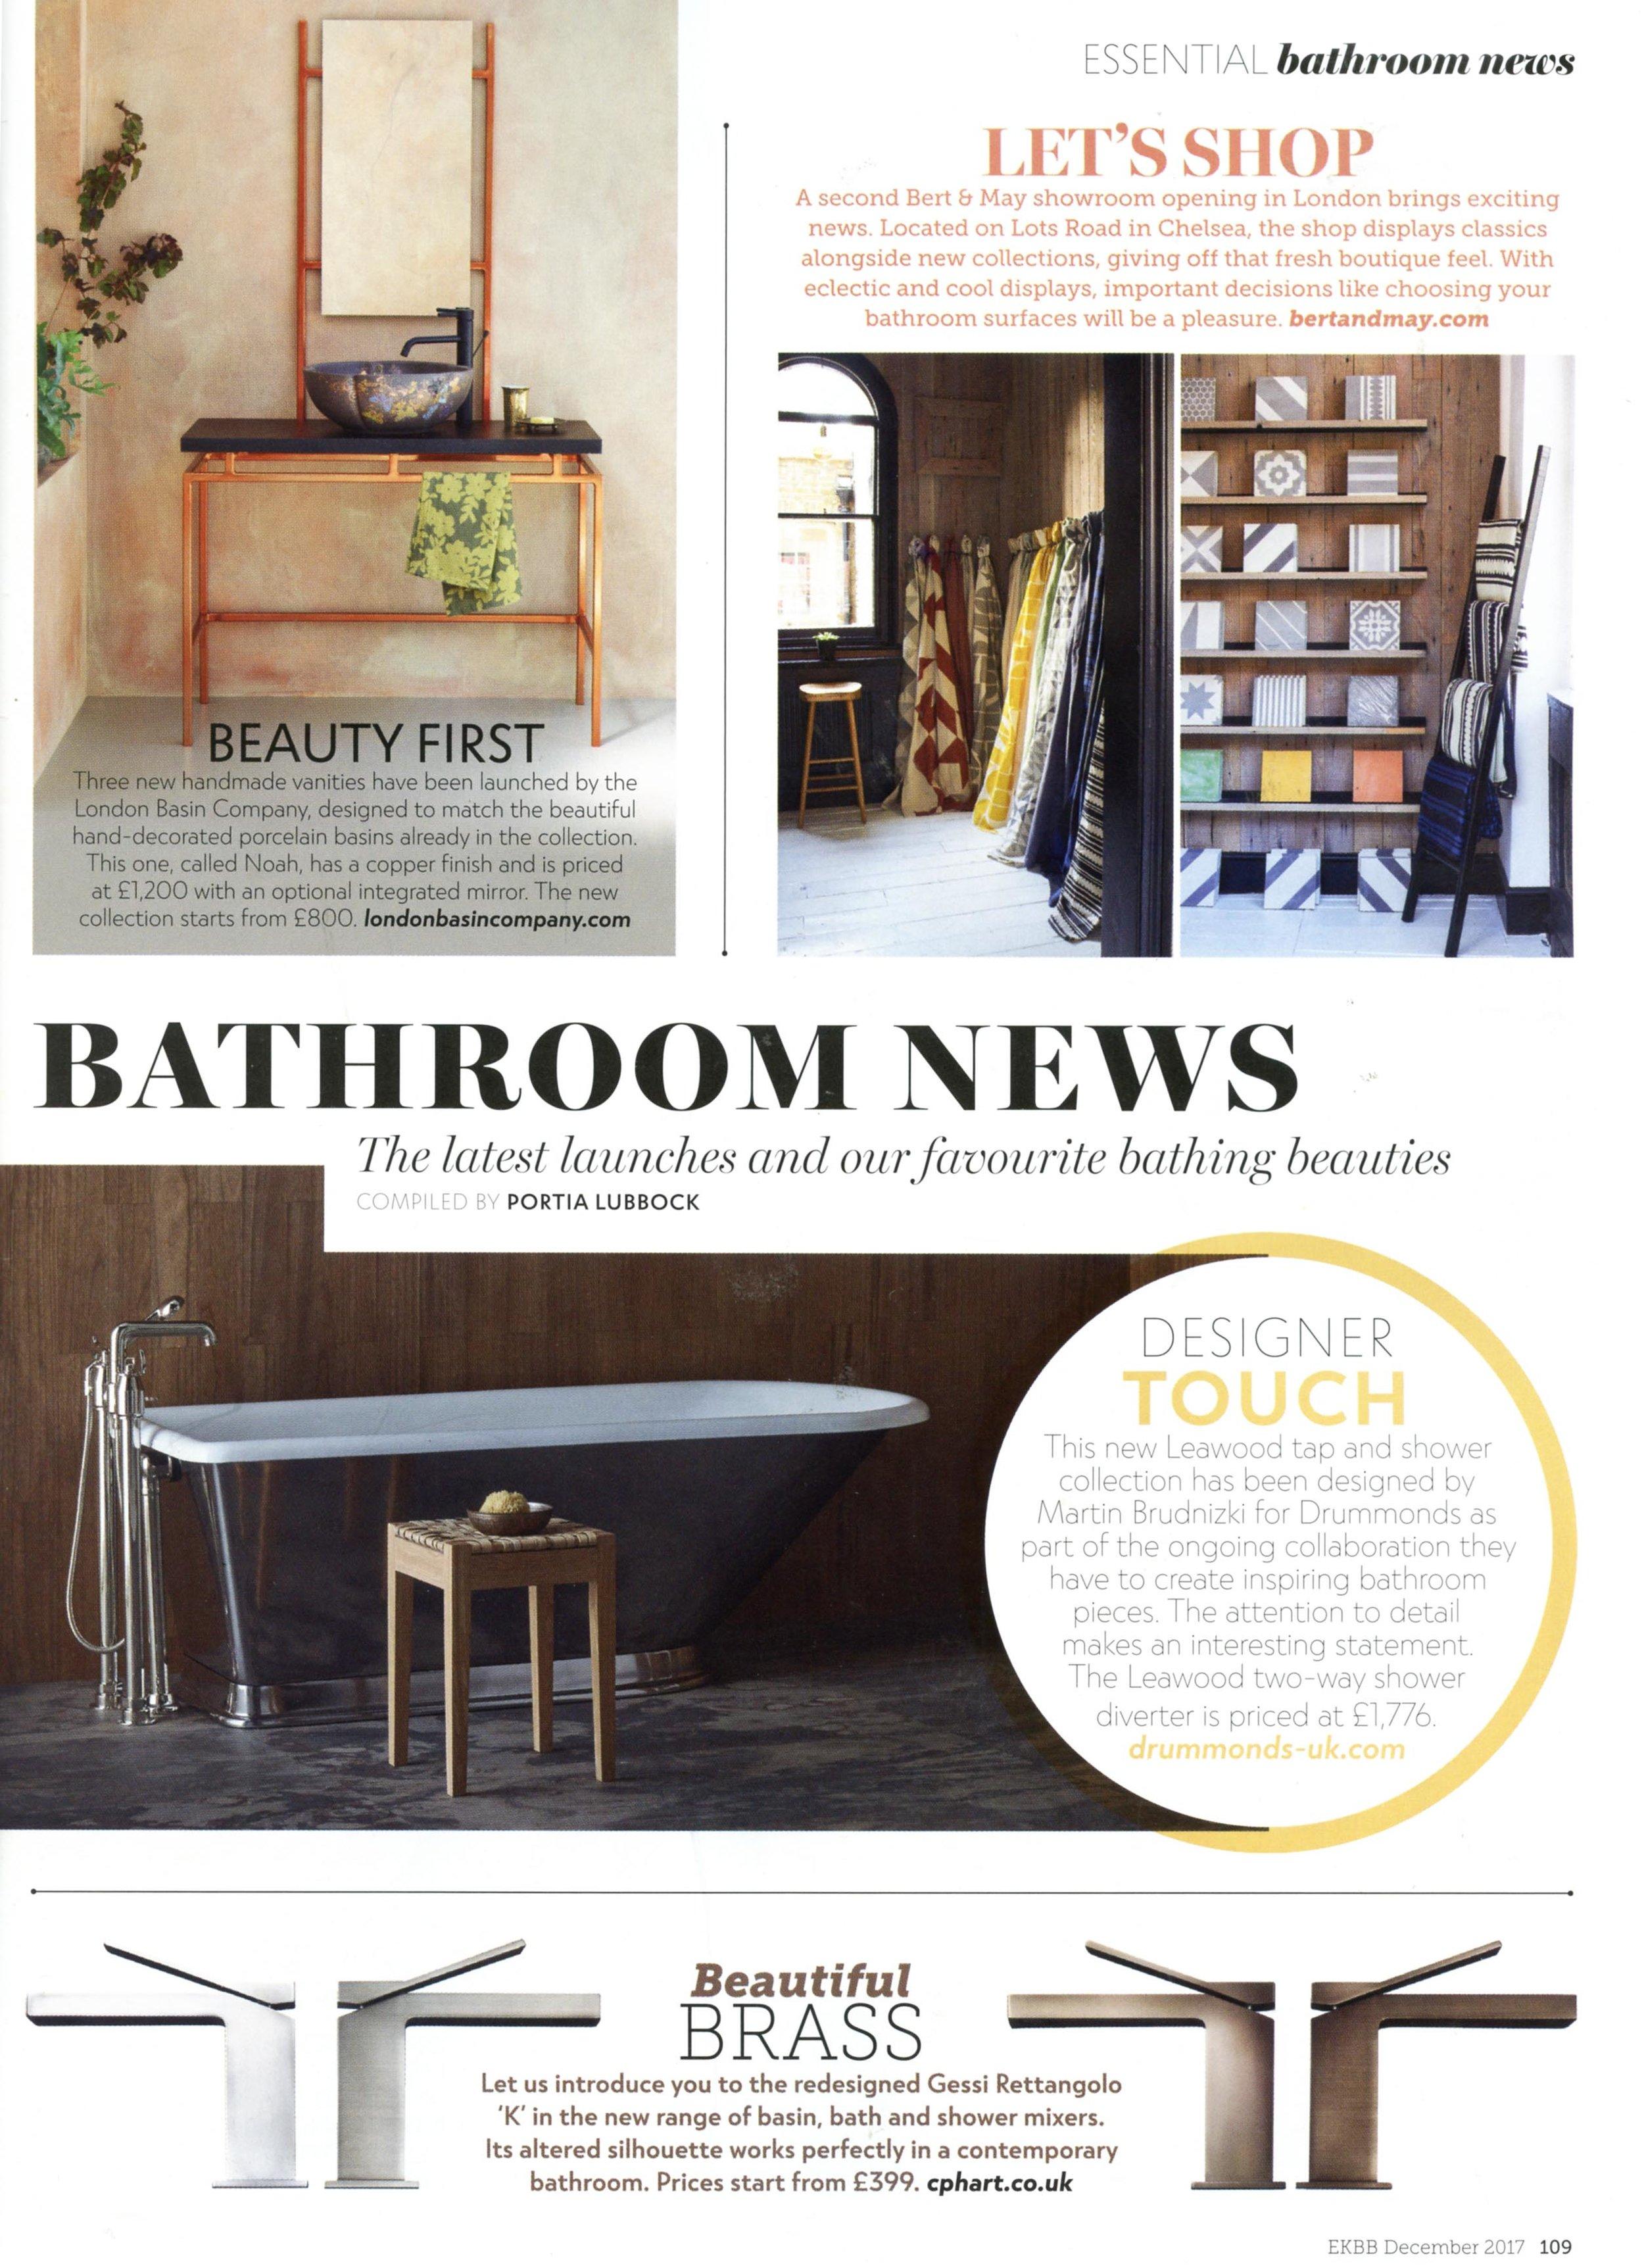 Essential Kitchen Bathroom Bedroom December 2017 LBC.jpg